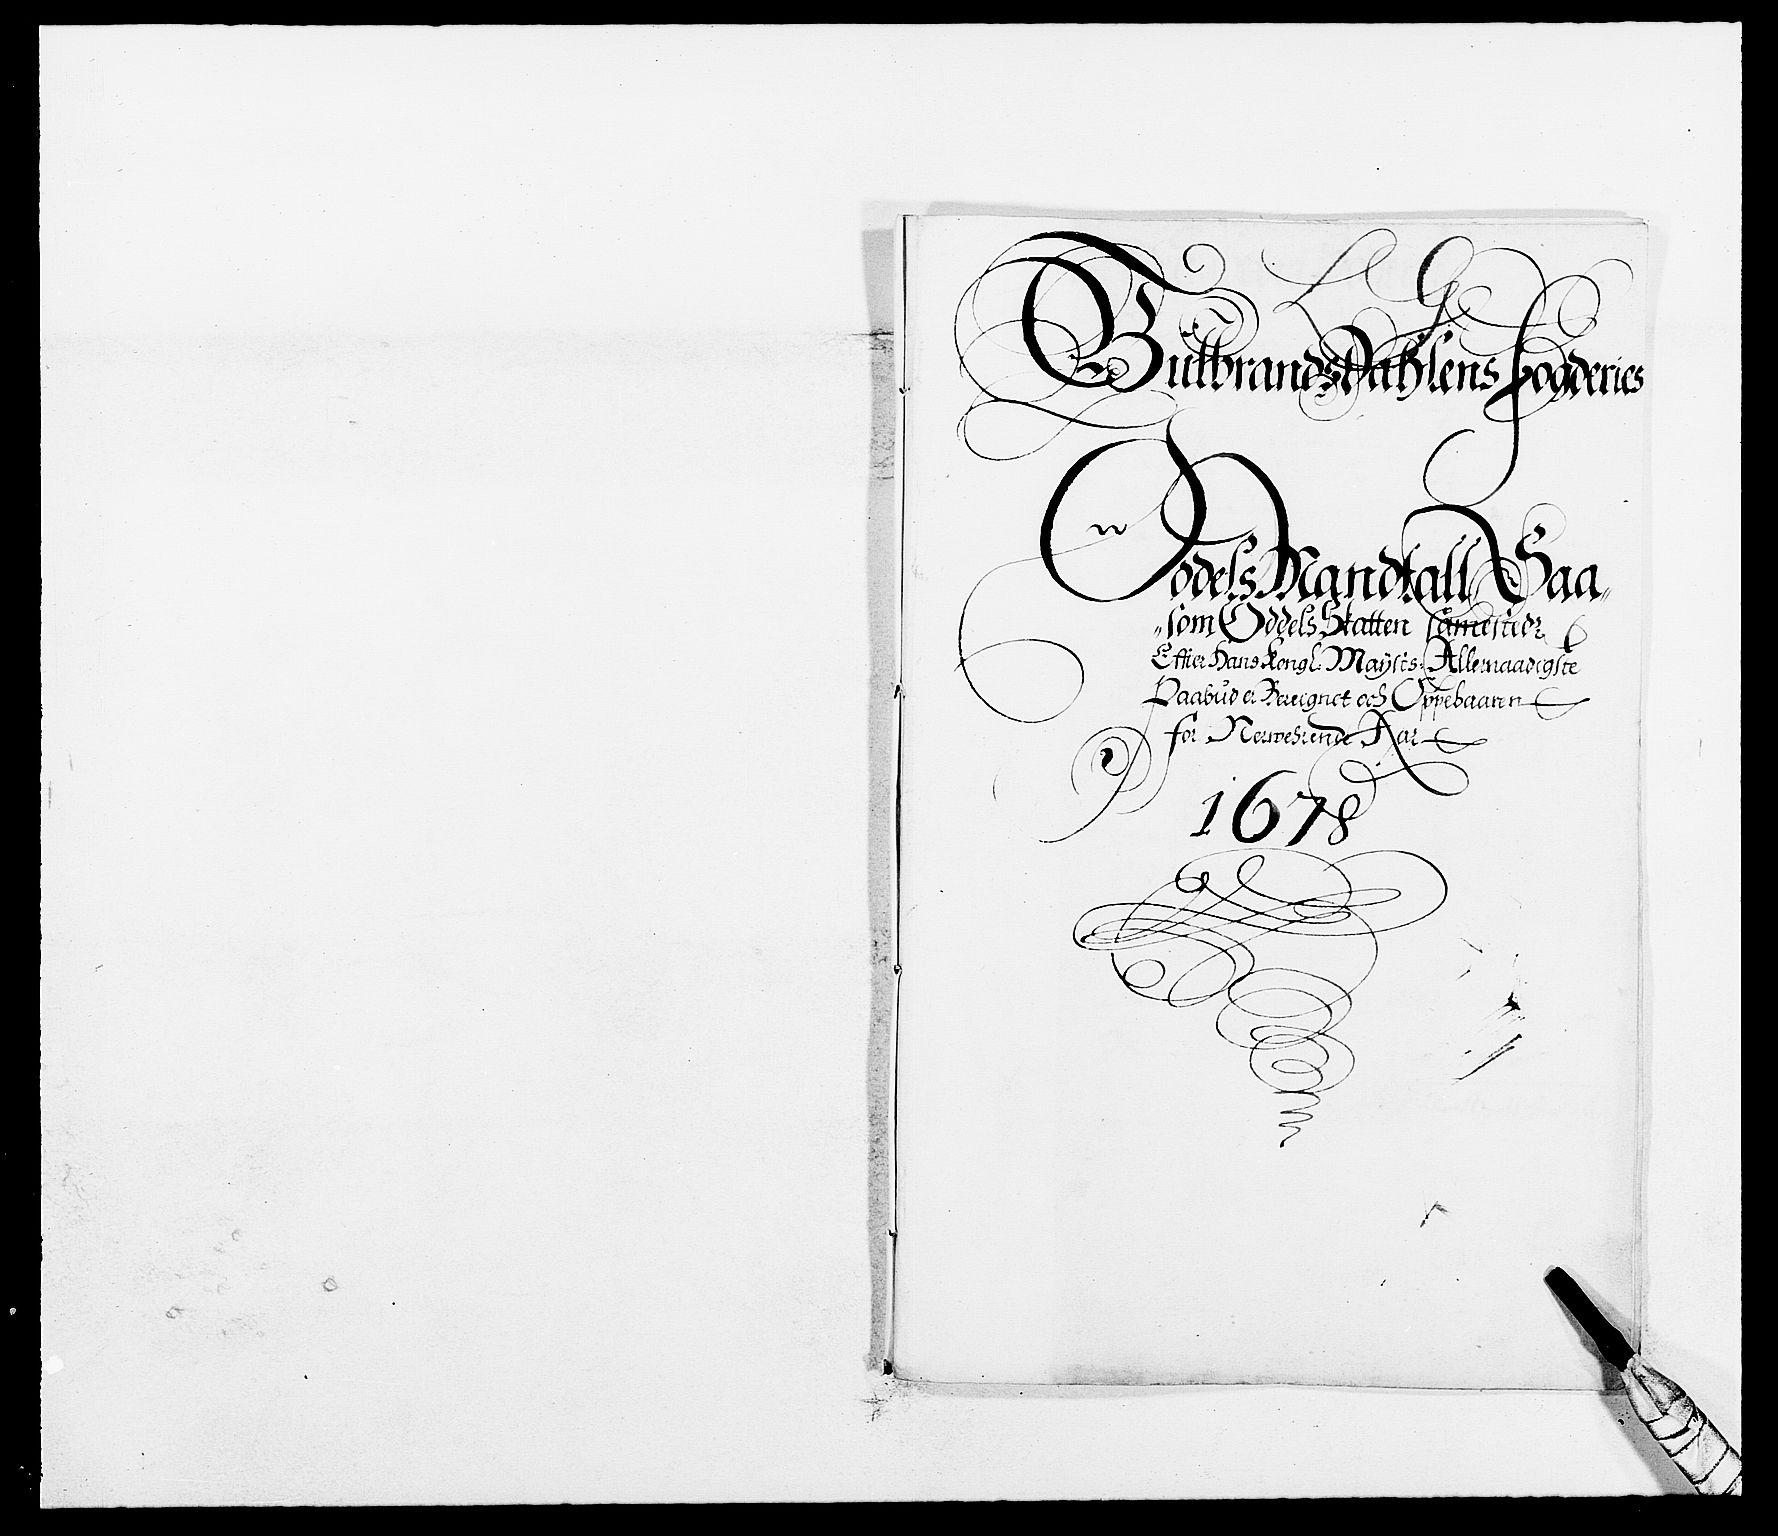 RA, Rentekammeret inntil 1814, Reviderte regnskaper, Fogderegnskap, R17/L1152: Fogderegnskap Gudbrandsdal, 1678-1679, s. 291